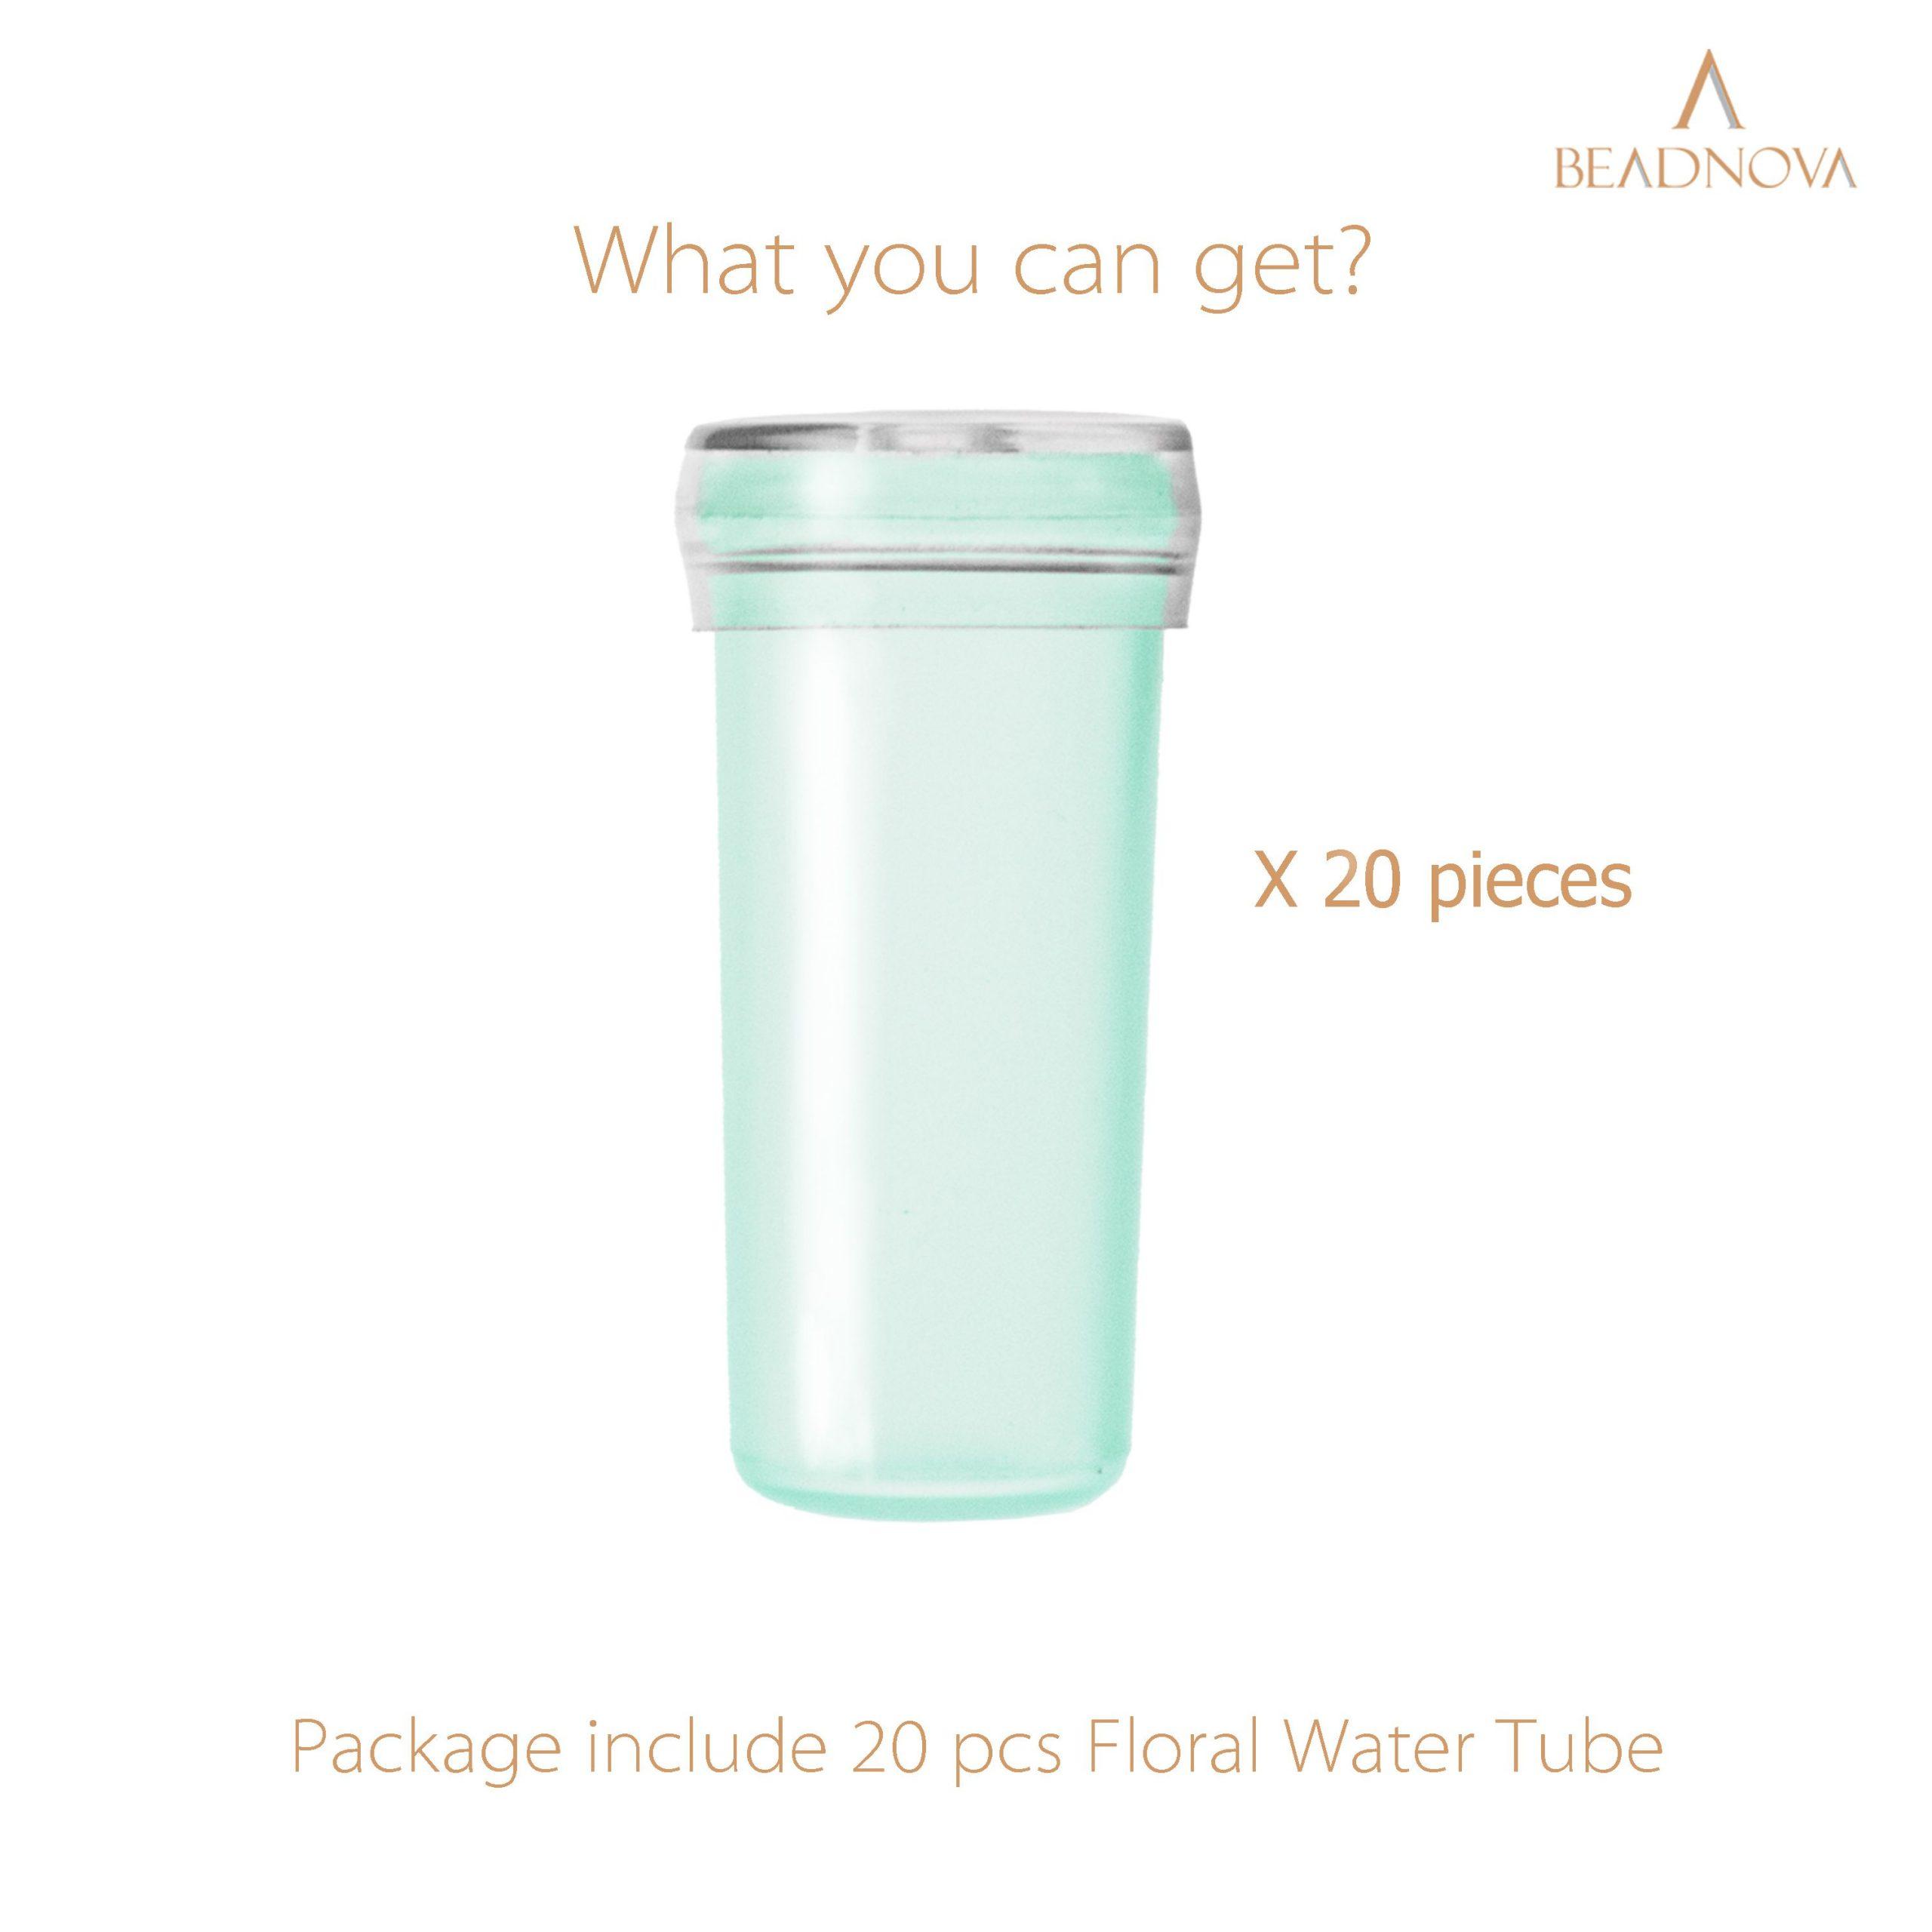 Floral-Water-Tubes-Green-Flower-Vials-4cm-20pcs